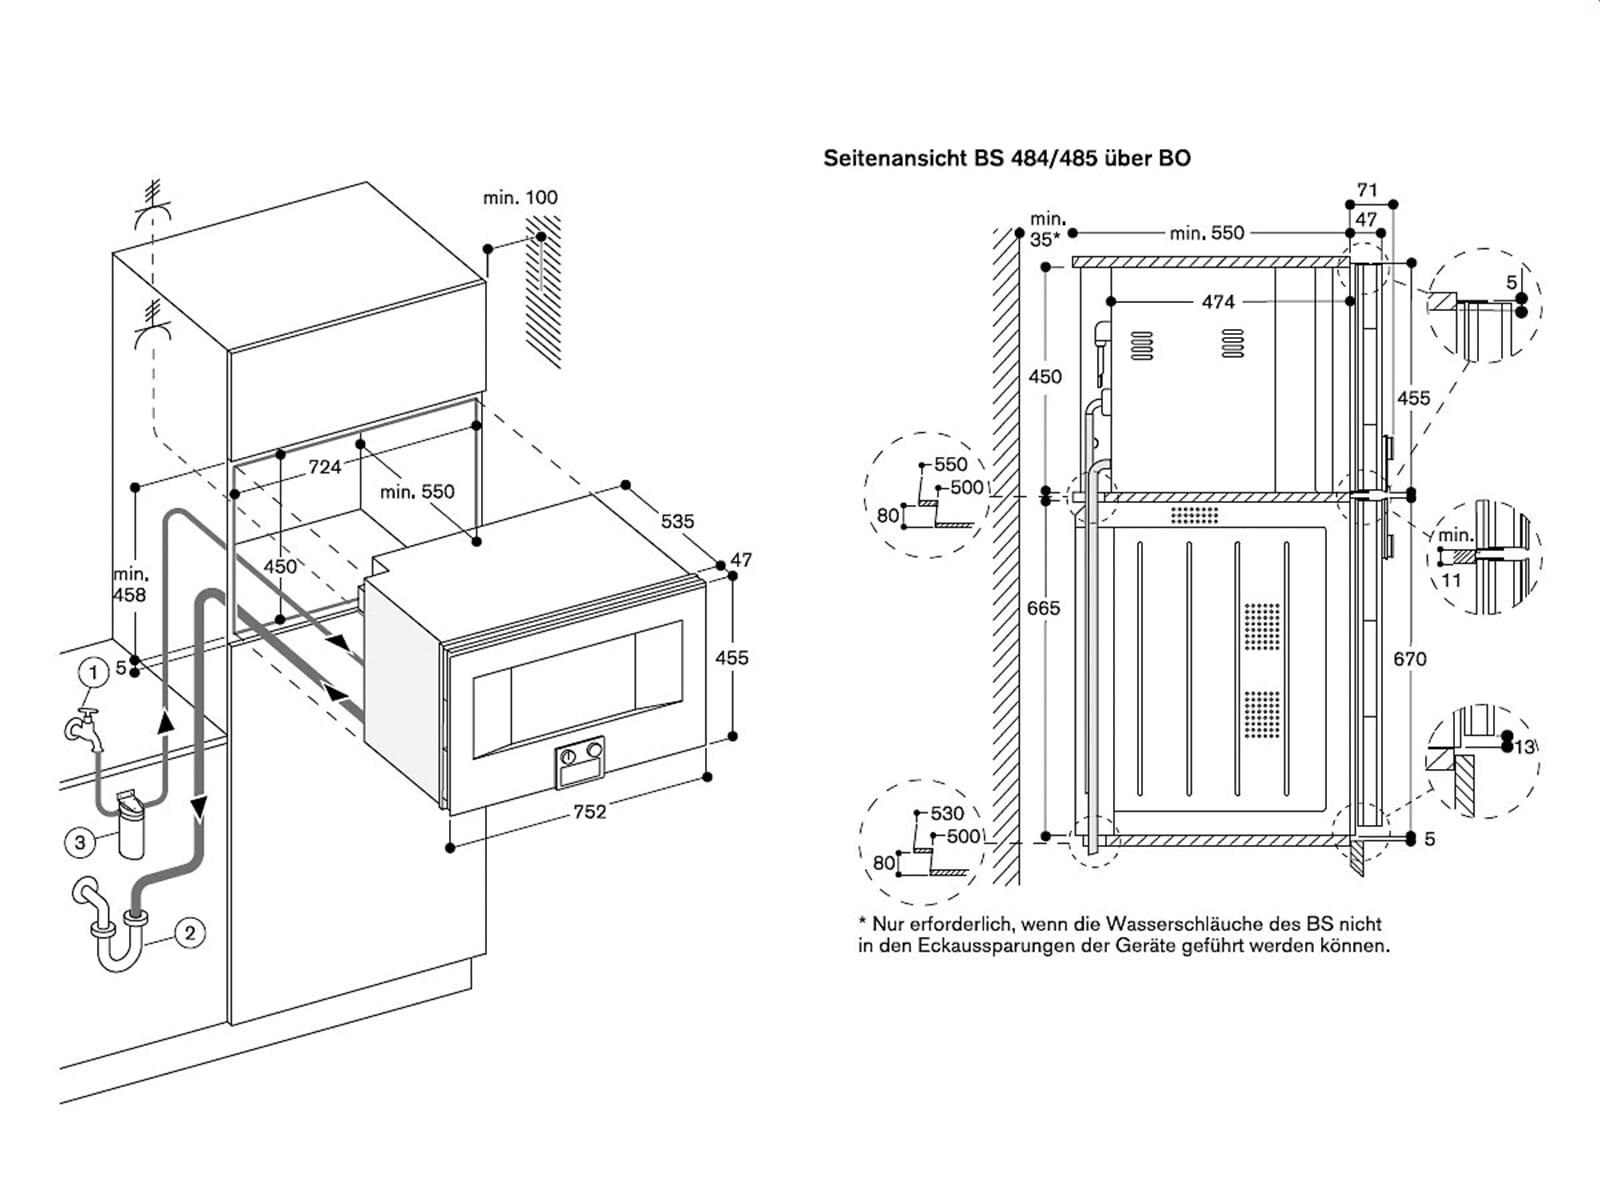 Gaggenau BS 485 111 Kompakt Dampfbackofen Serie 400 Edelstahl/Glas